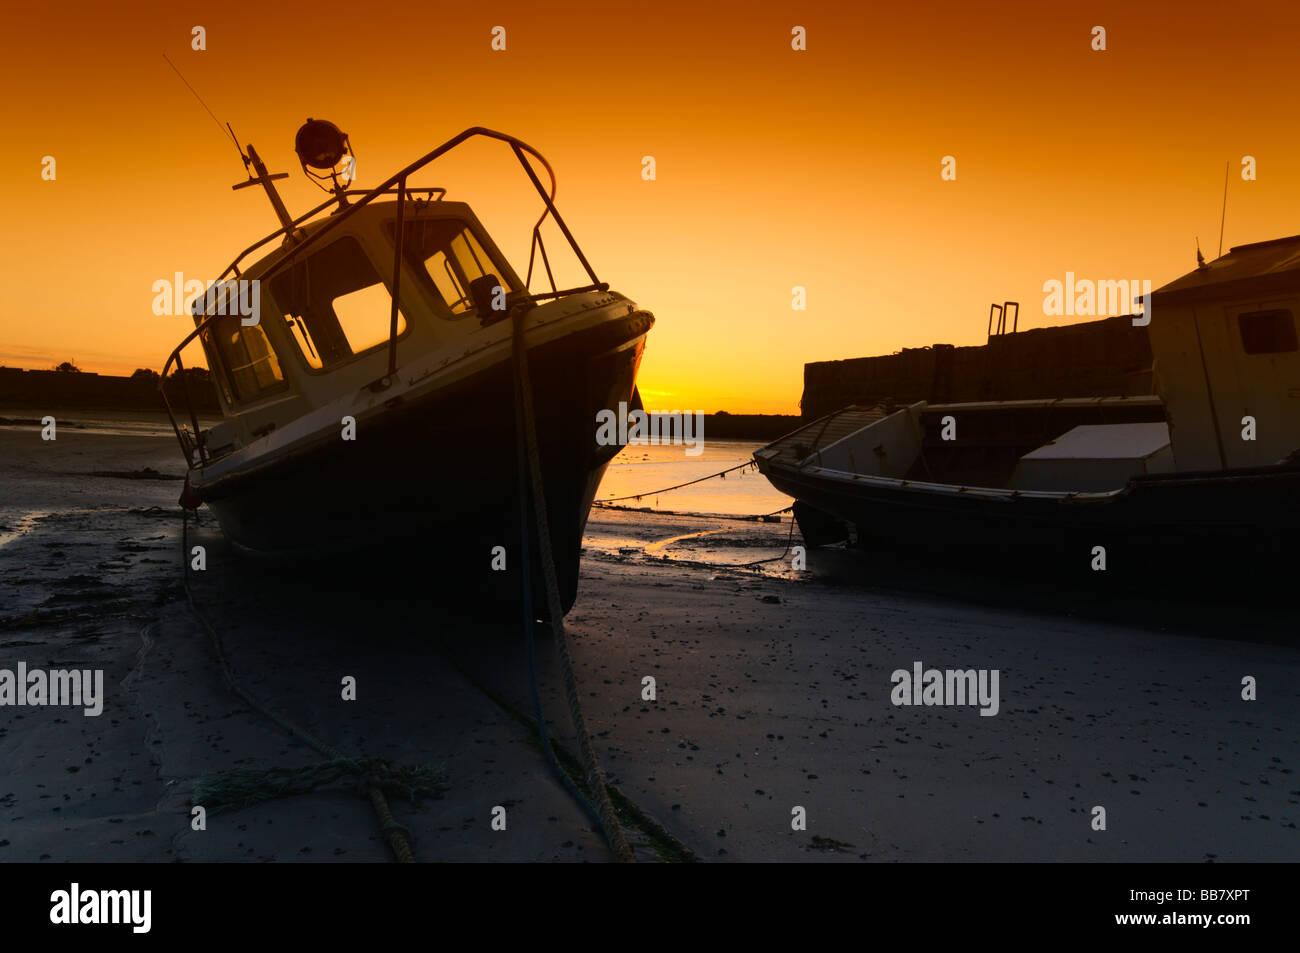 Boats on the shore in Rush, Co. Dublin, Ireland - Stock Image